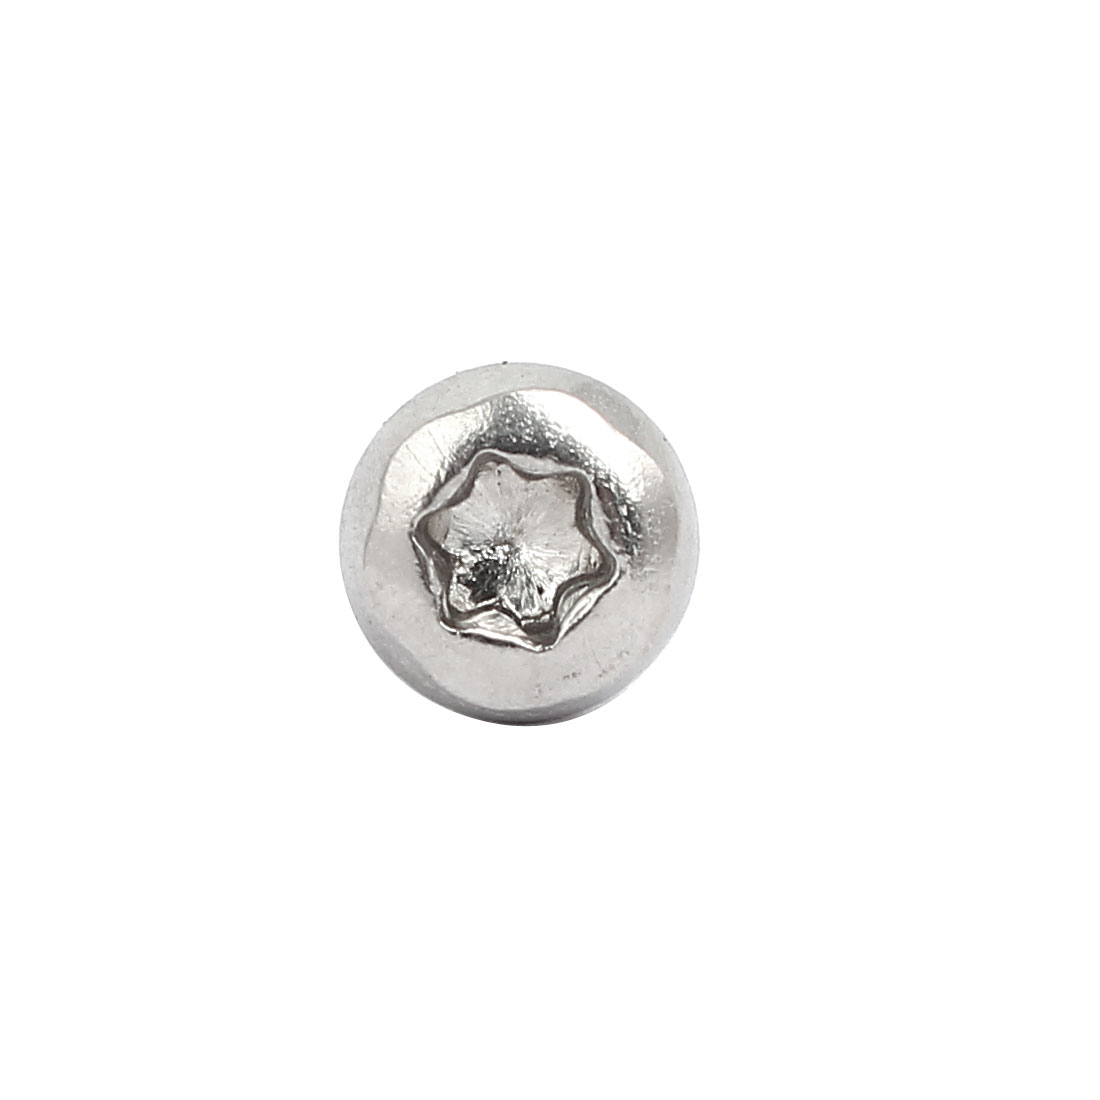 Unique Bargains M4x8mm 304 Stainless Steel Button Head Torx Screws Bolts T20 Drive 100pcs - image 3 of 3